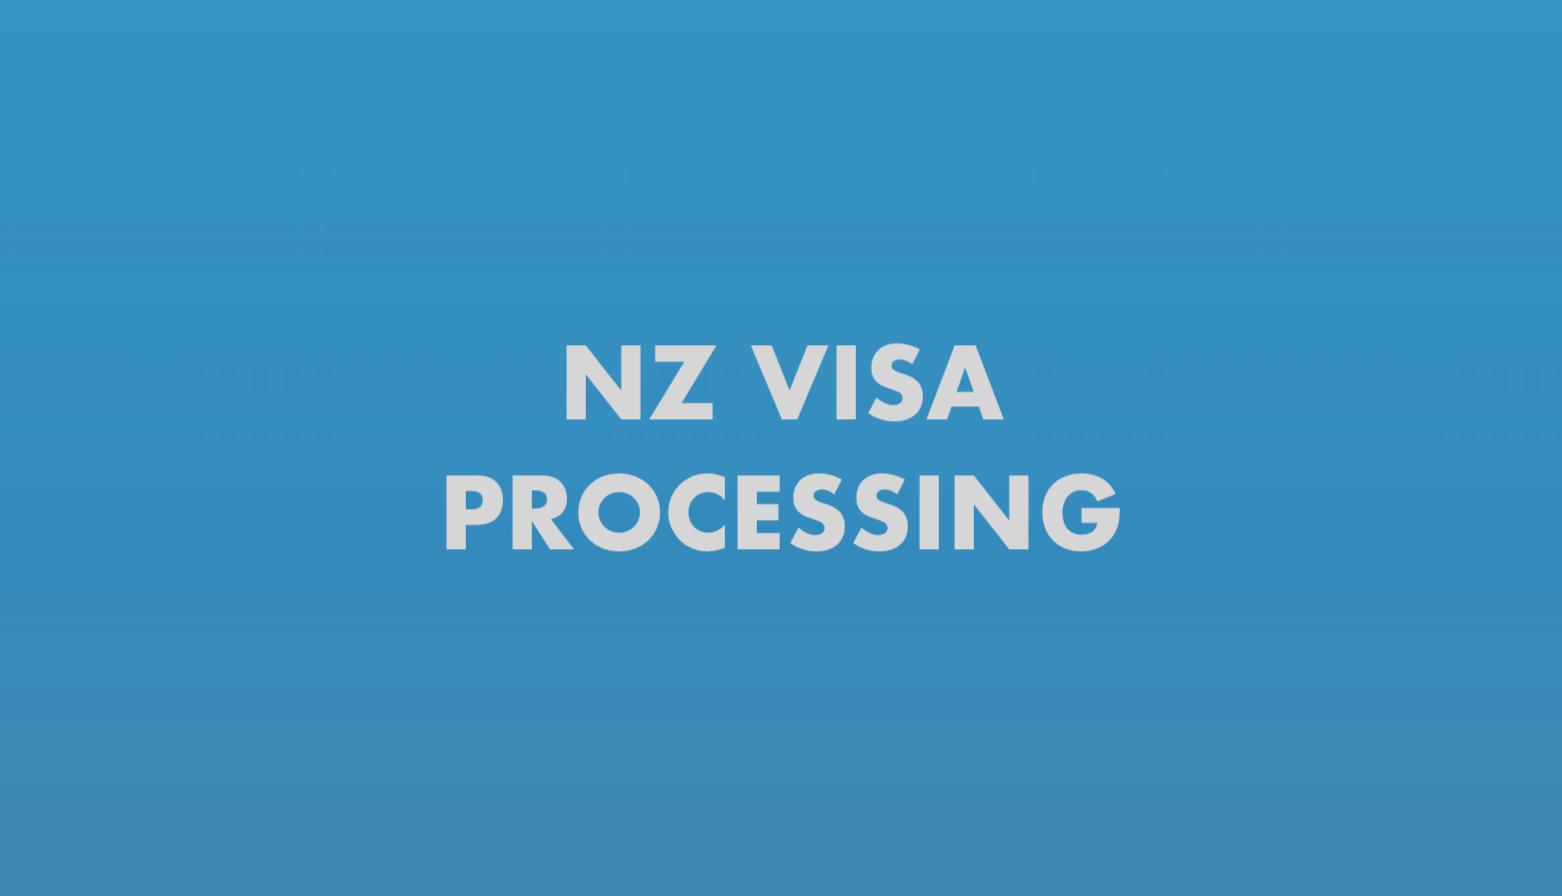 NZ Visa Processing